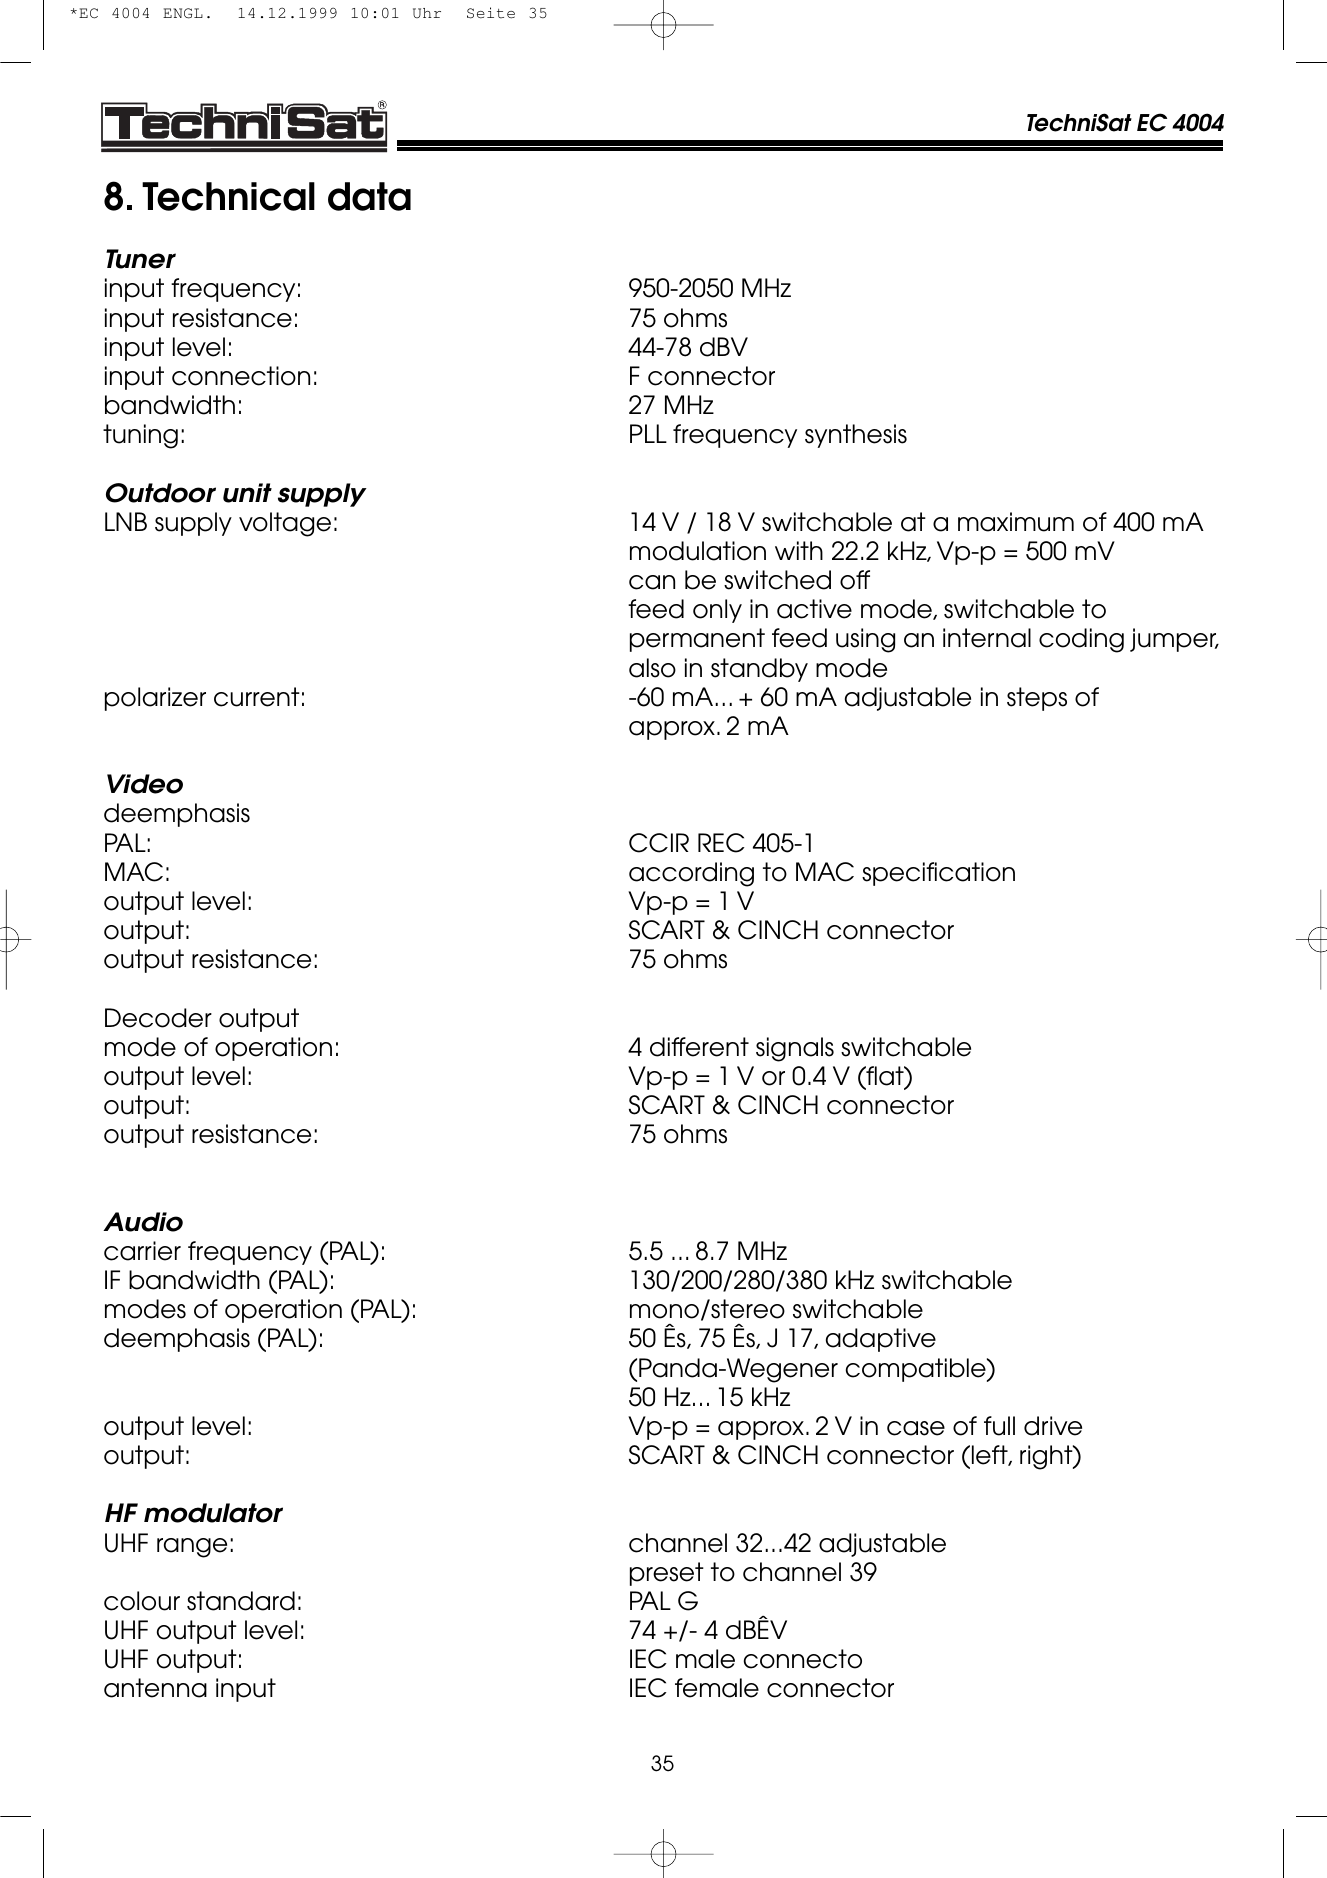 Technisat Ec 4004 Users Manual *EC ENGL